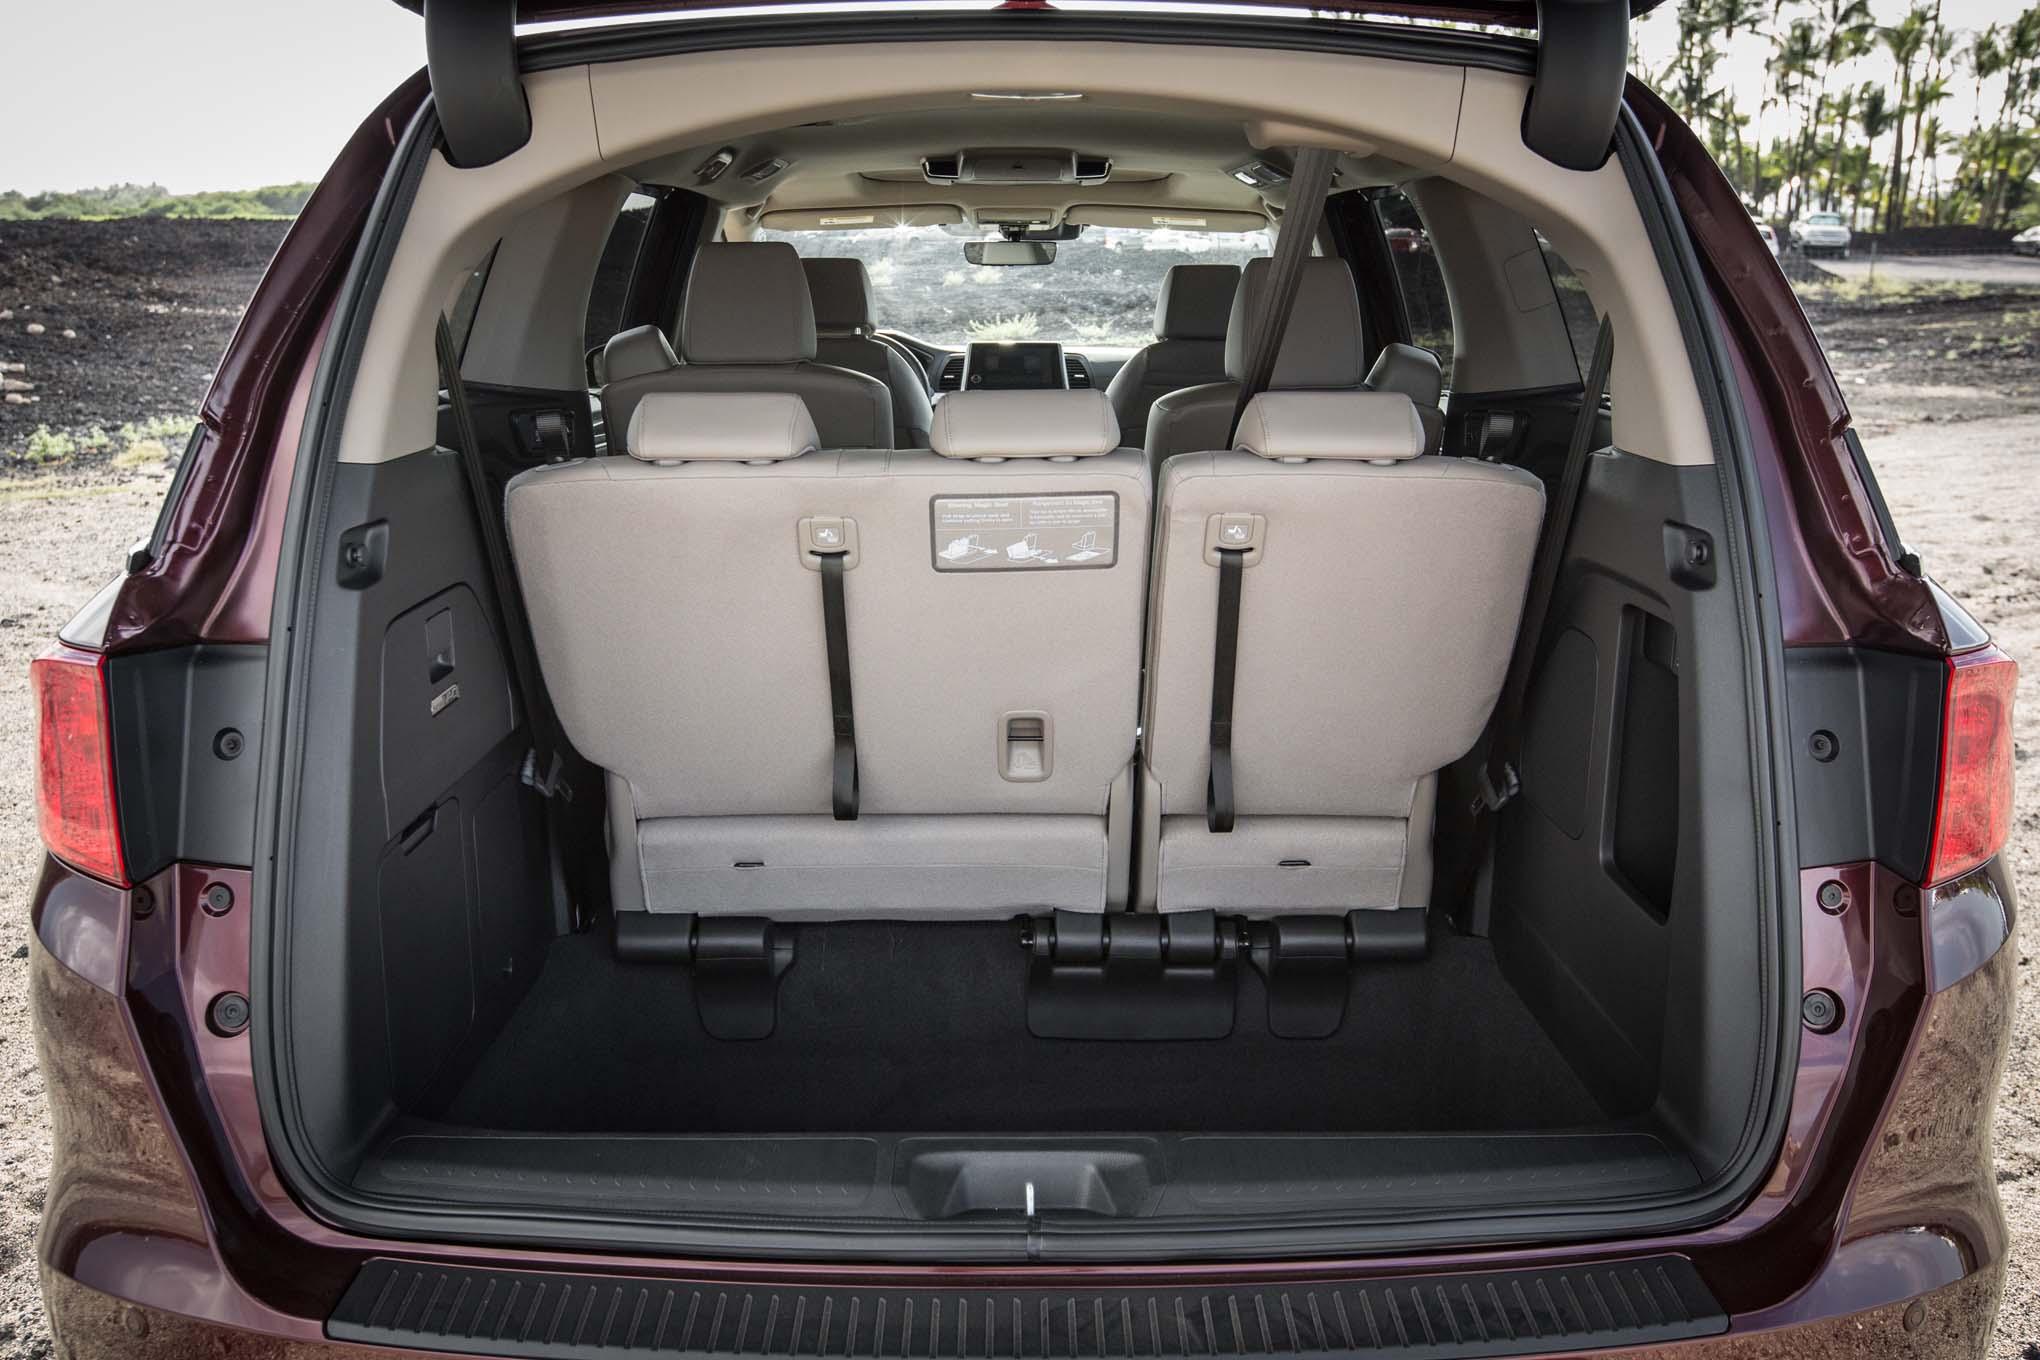 Honda Odyssey Cargo Space on 05 Dodge Durango Mpg